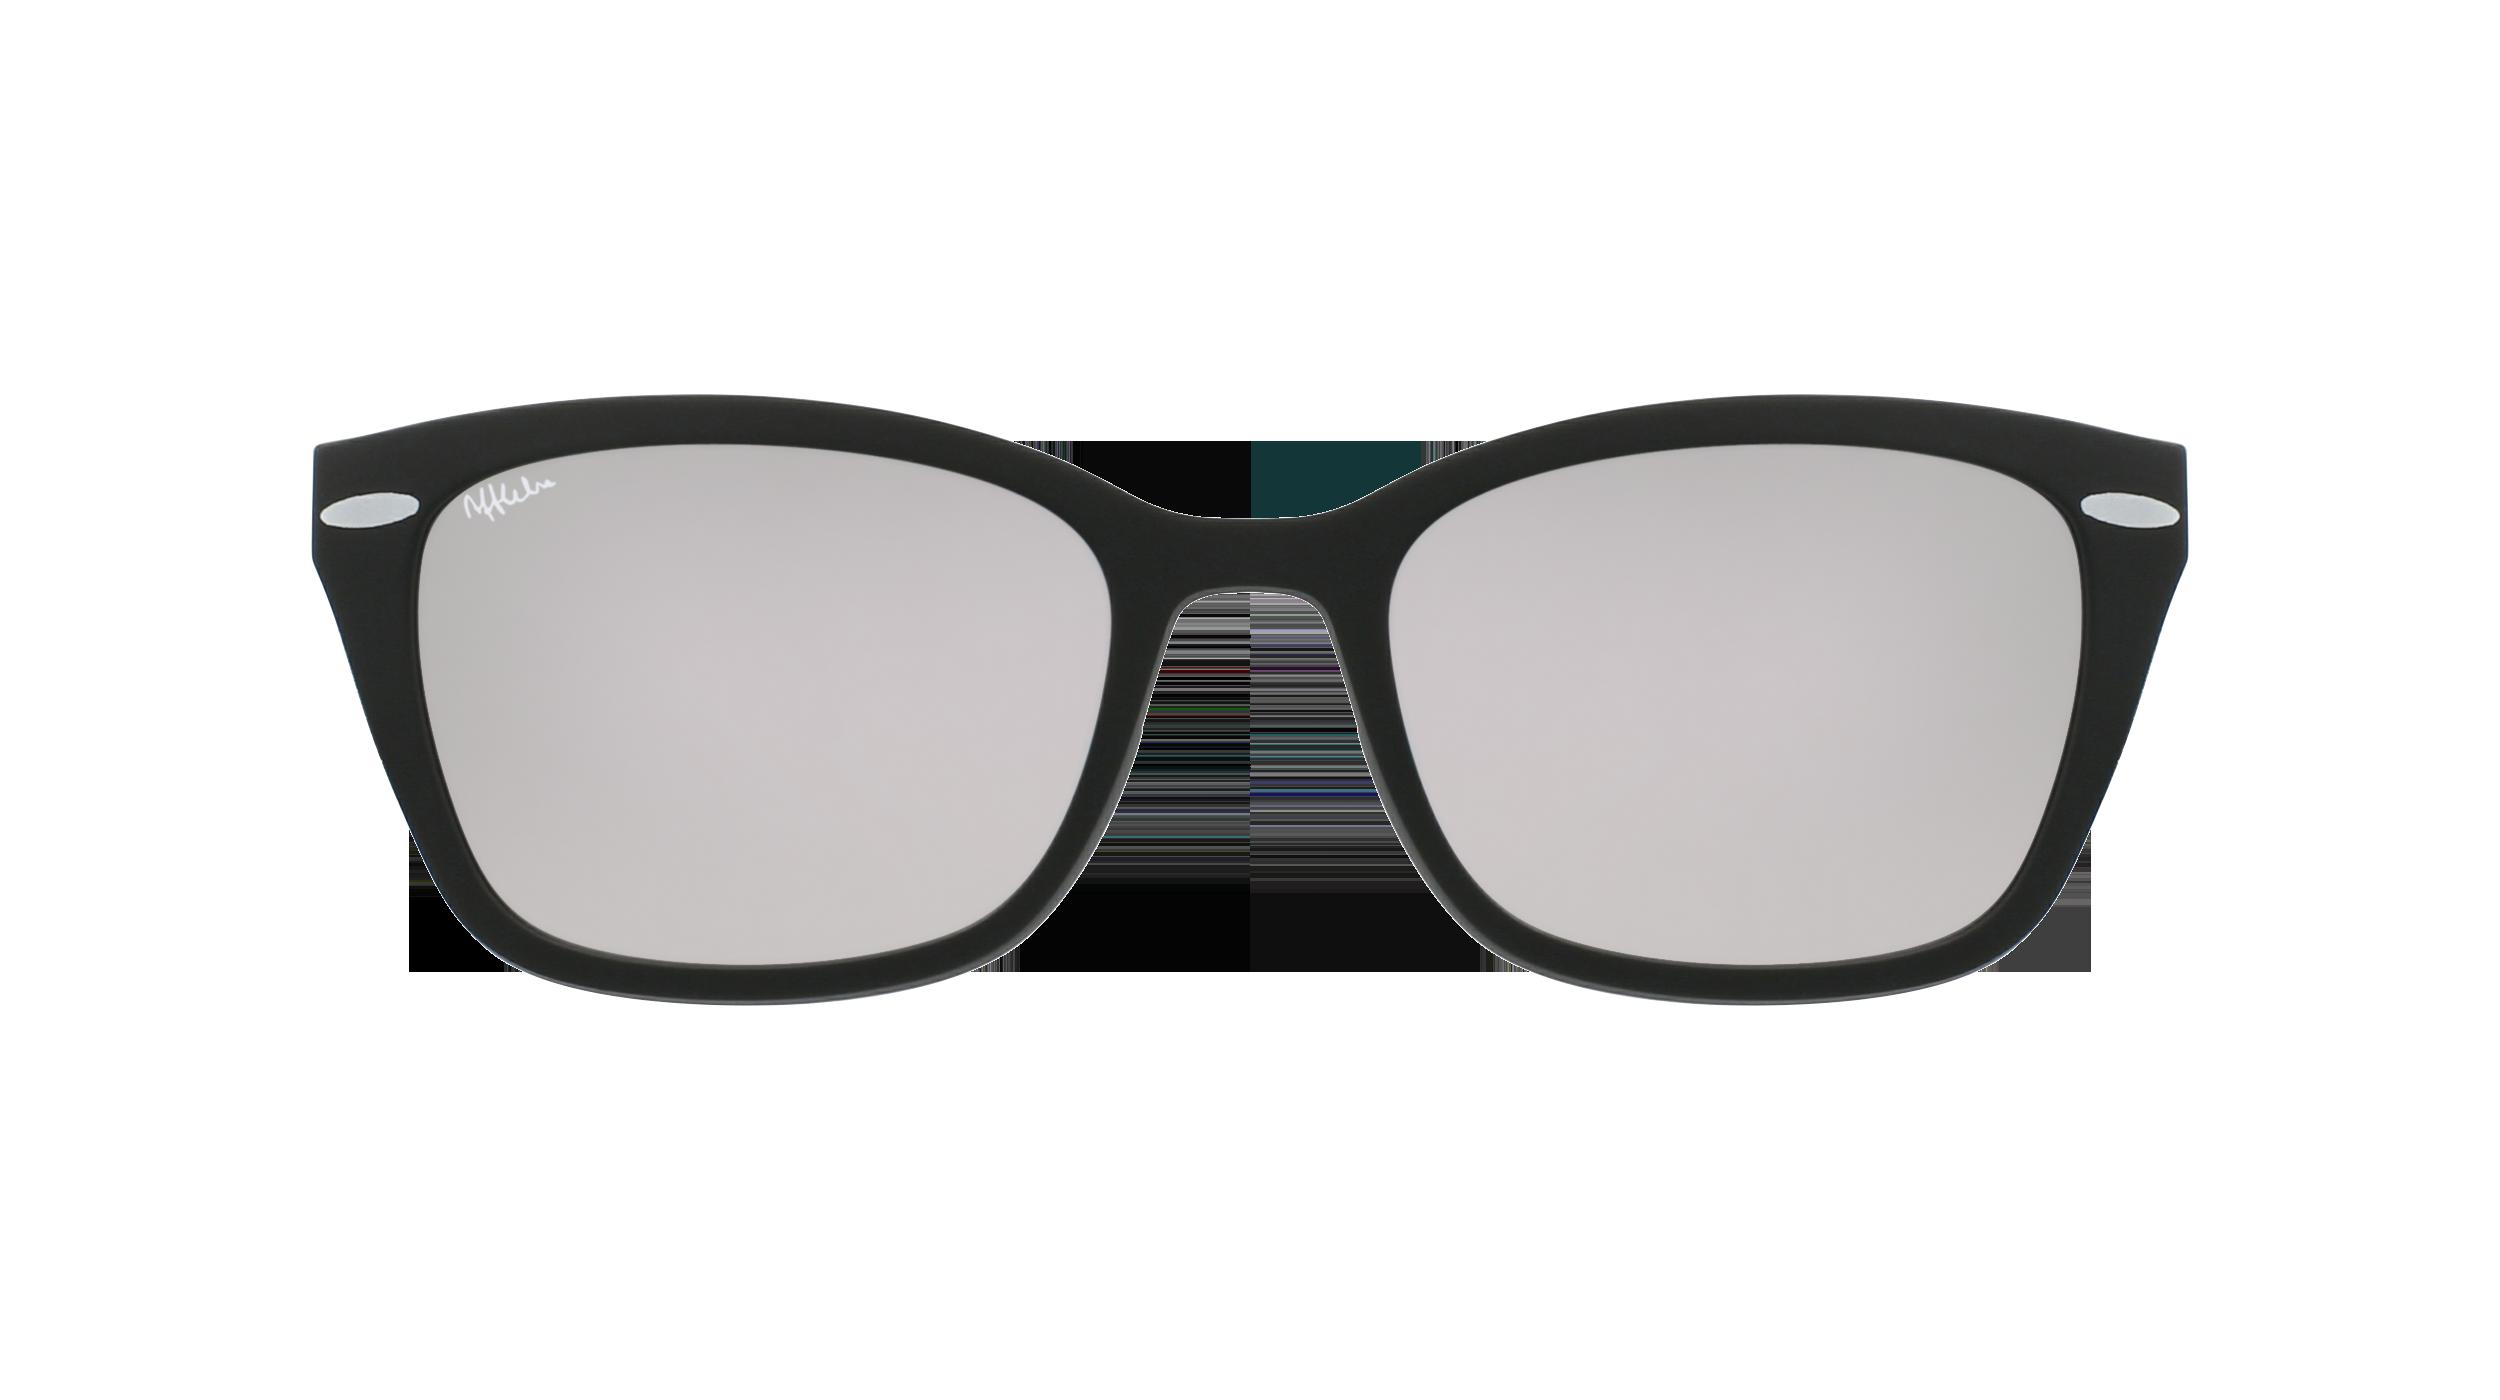 afflelou/france/products/smart_clip/clips_glasses/07630036459072.png